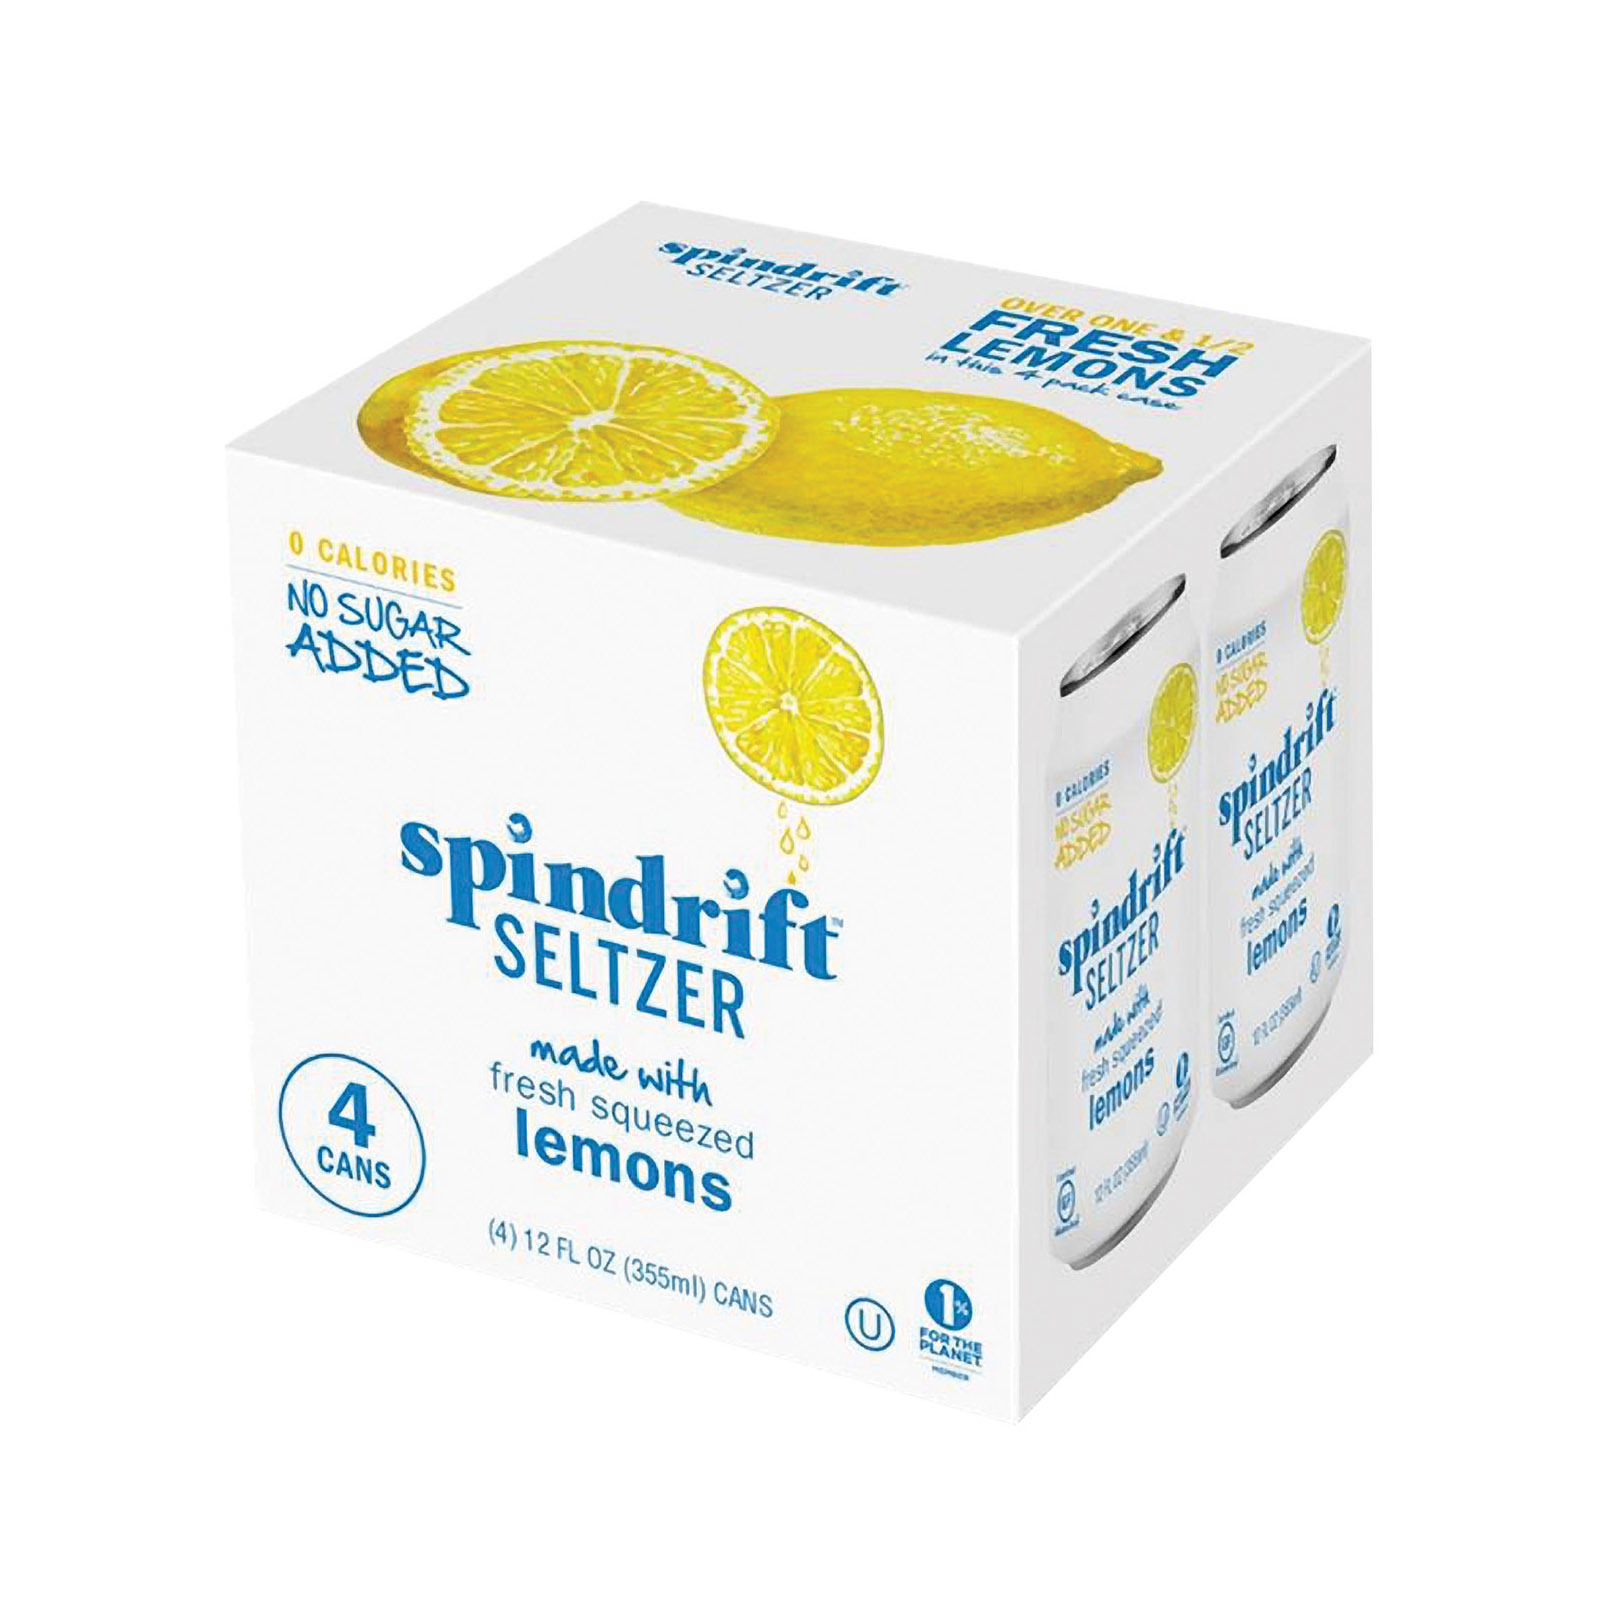 Spindrift Sparkling Water - Lemon - 4 pack 12 oz can - Case of 6